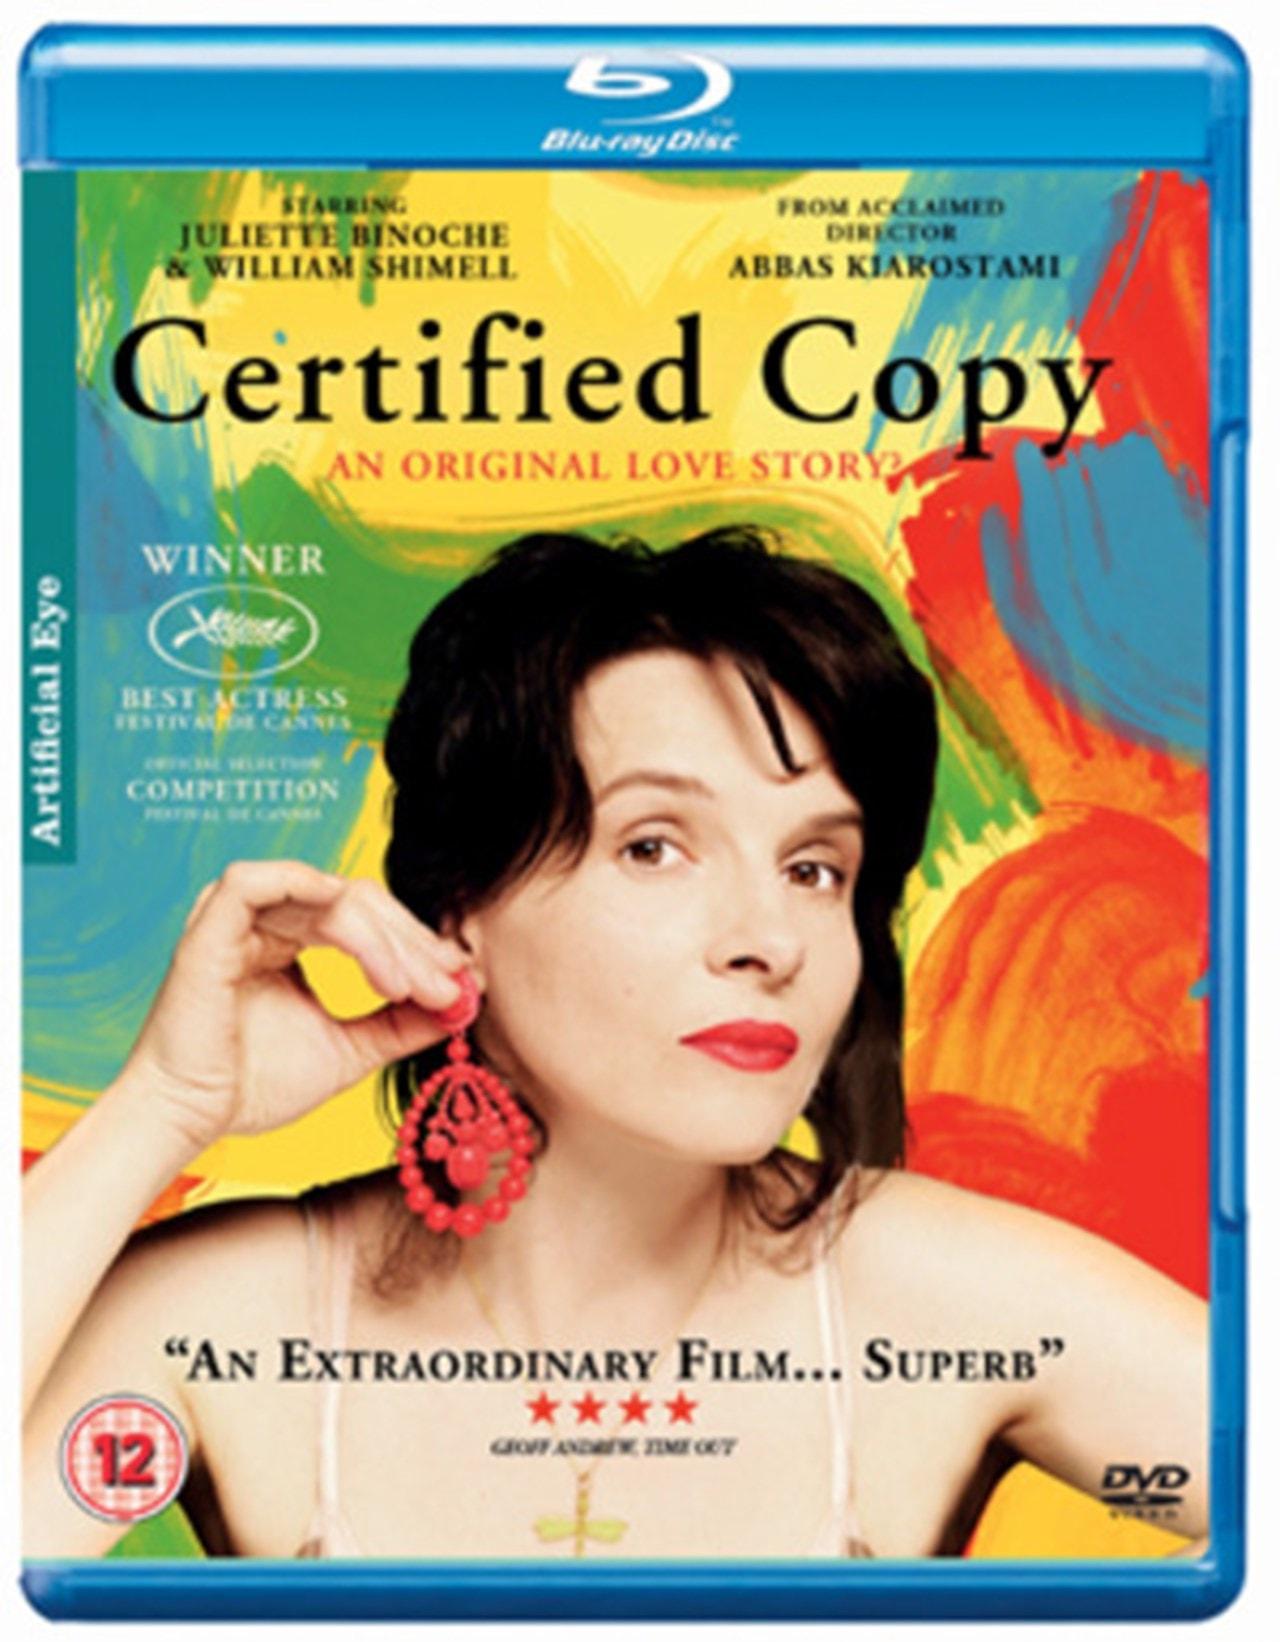 Certified Copy - 1